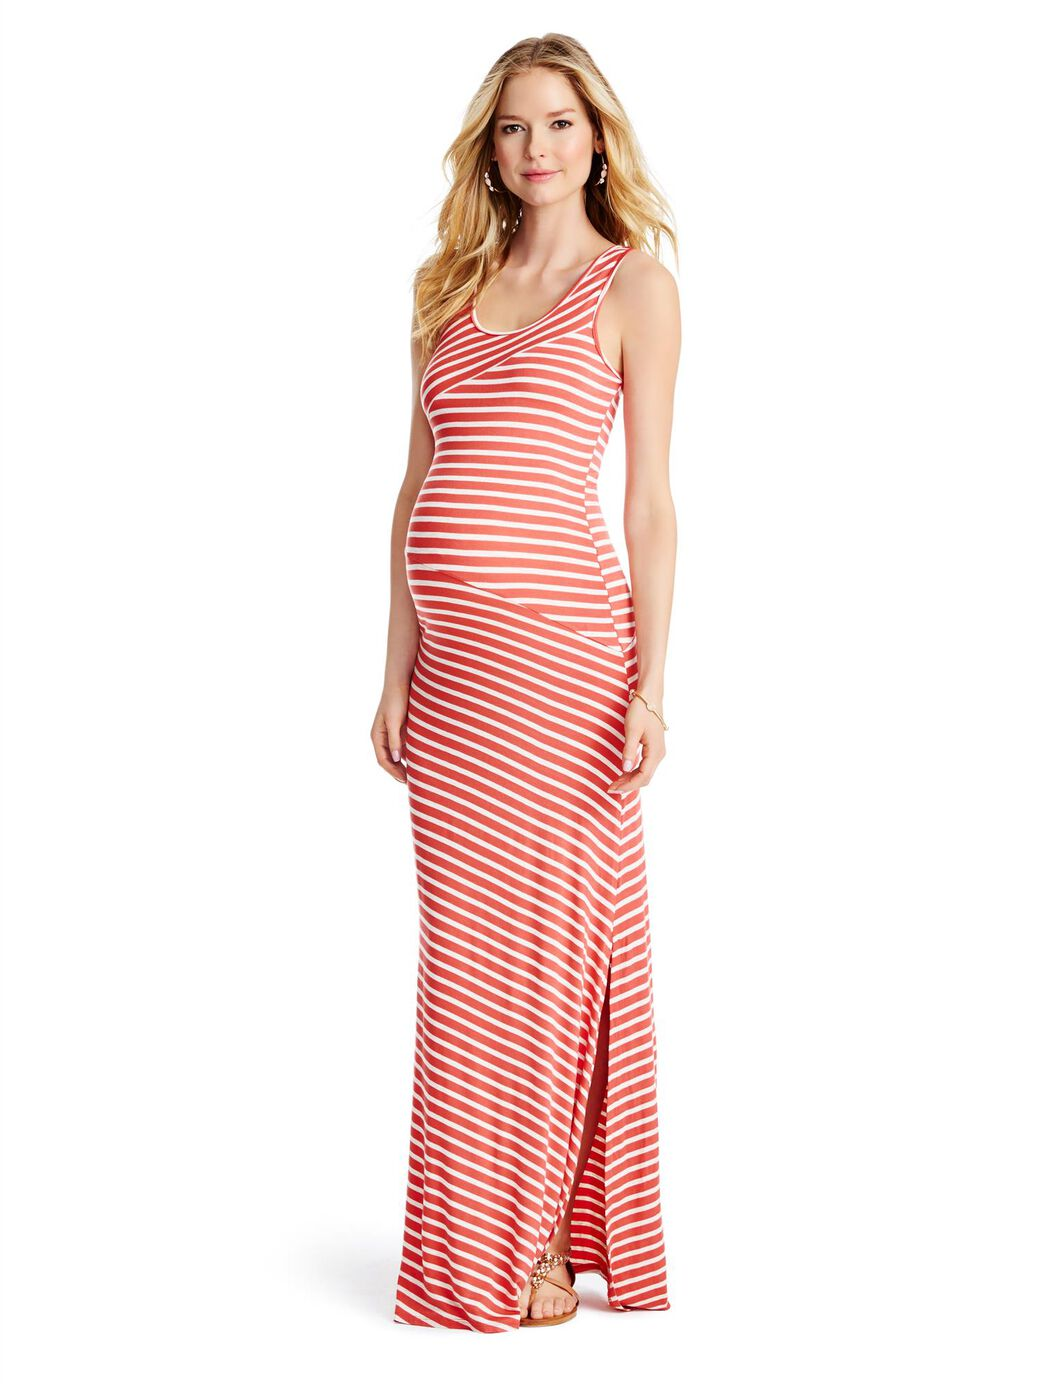 Jessica simpson pleated maternity maxi dress motherhood maternity jessica simpson pleated maternity maxi dress orange stripe ombrellifo Image collections